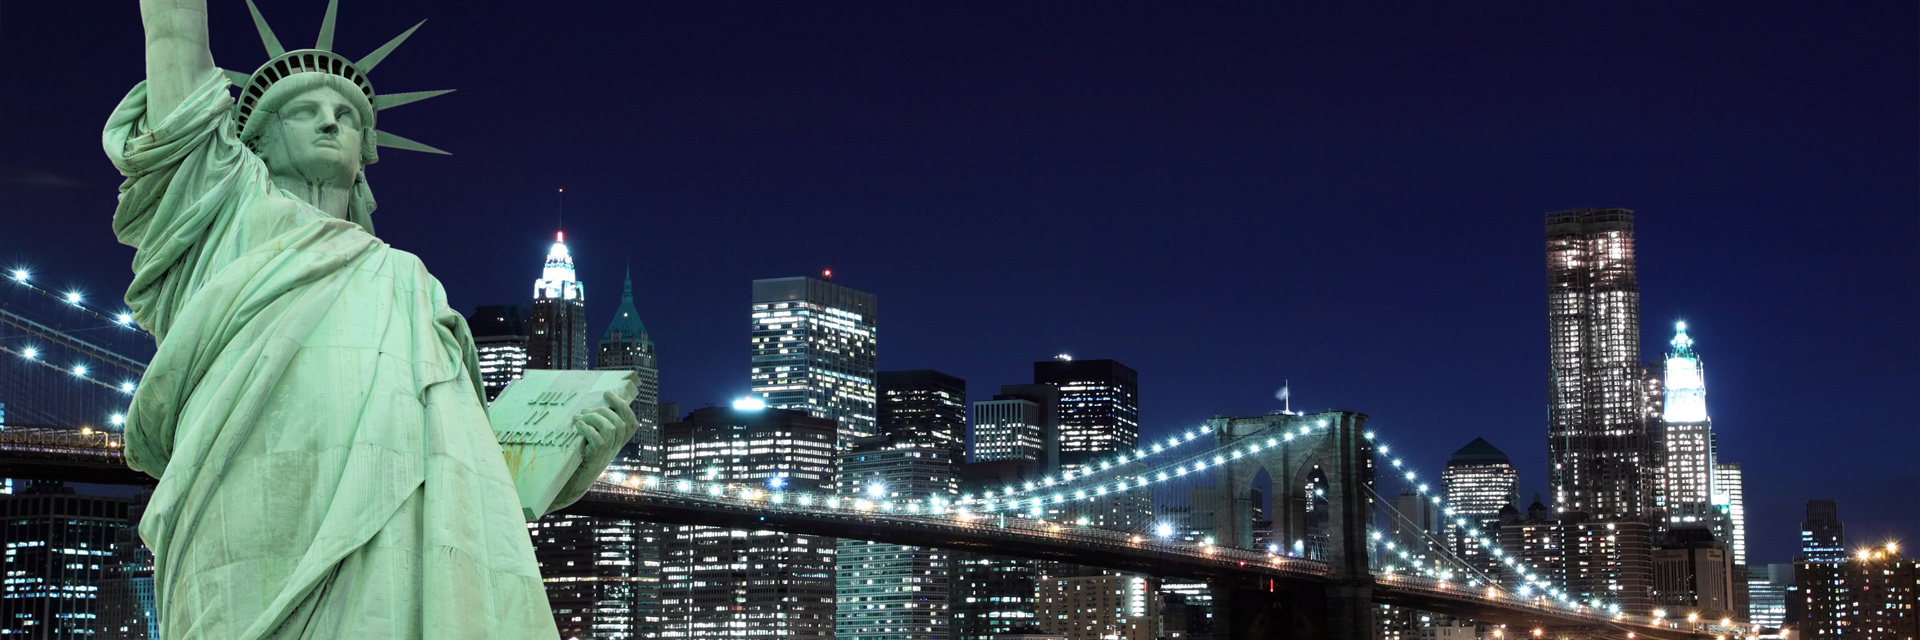 Viajes Combinado Newyork